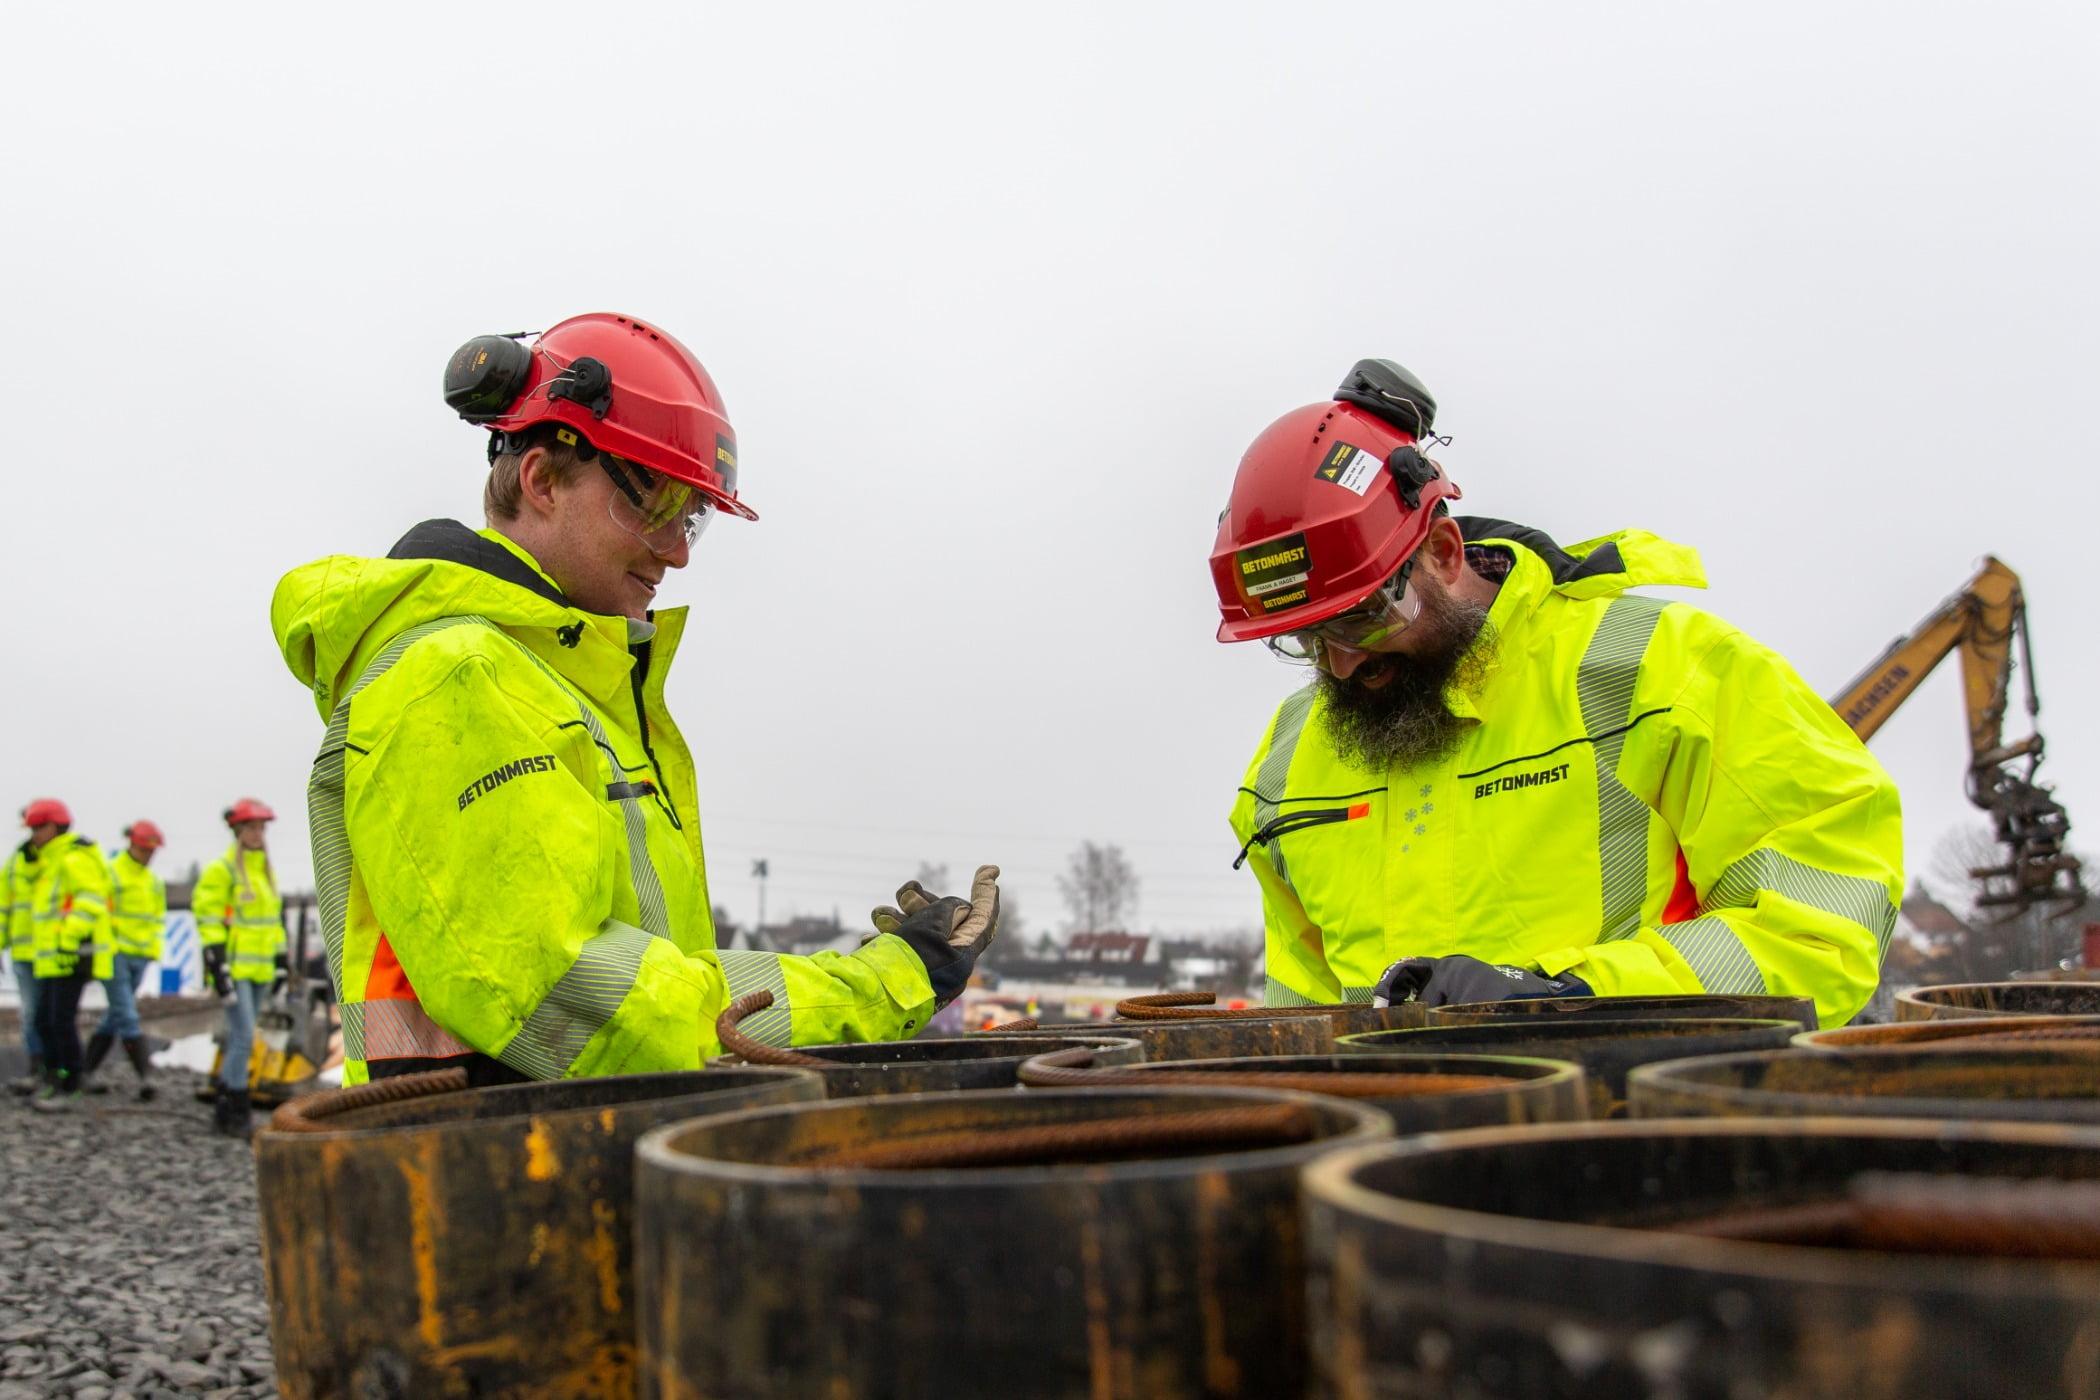 Hard hat, High-visibility clothing, Natural environment, Helmet, Workwear, Tradesman, Plant, Engineer, Goggles, Sky